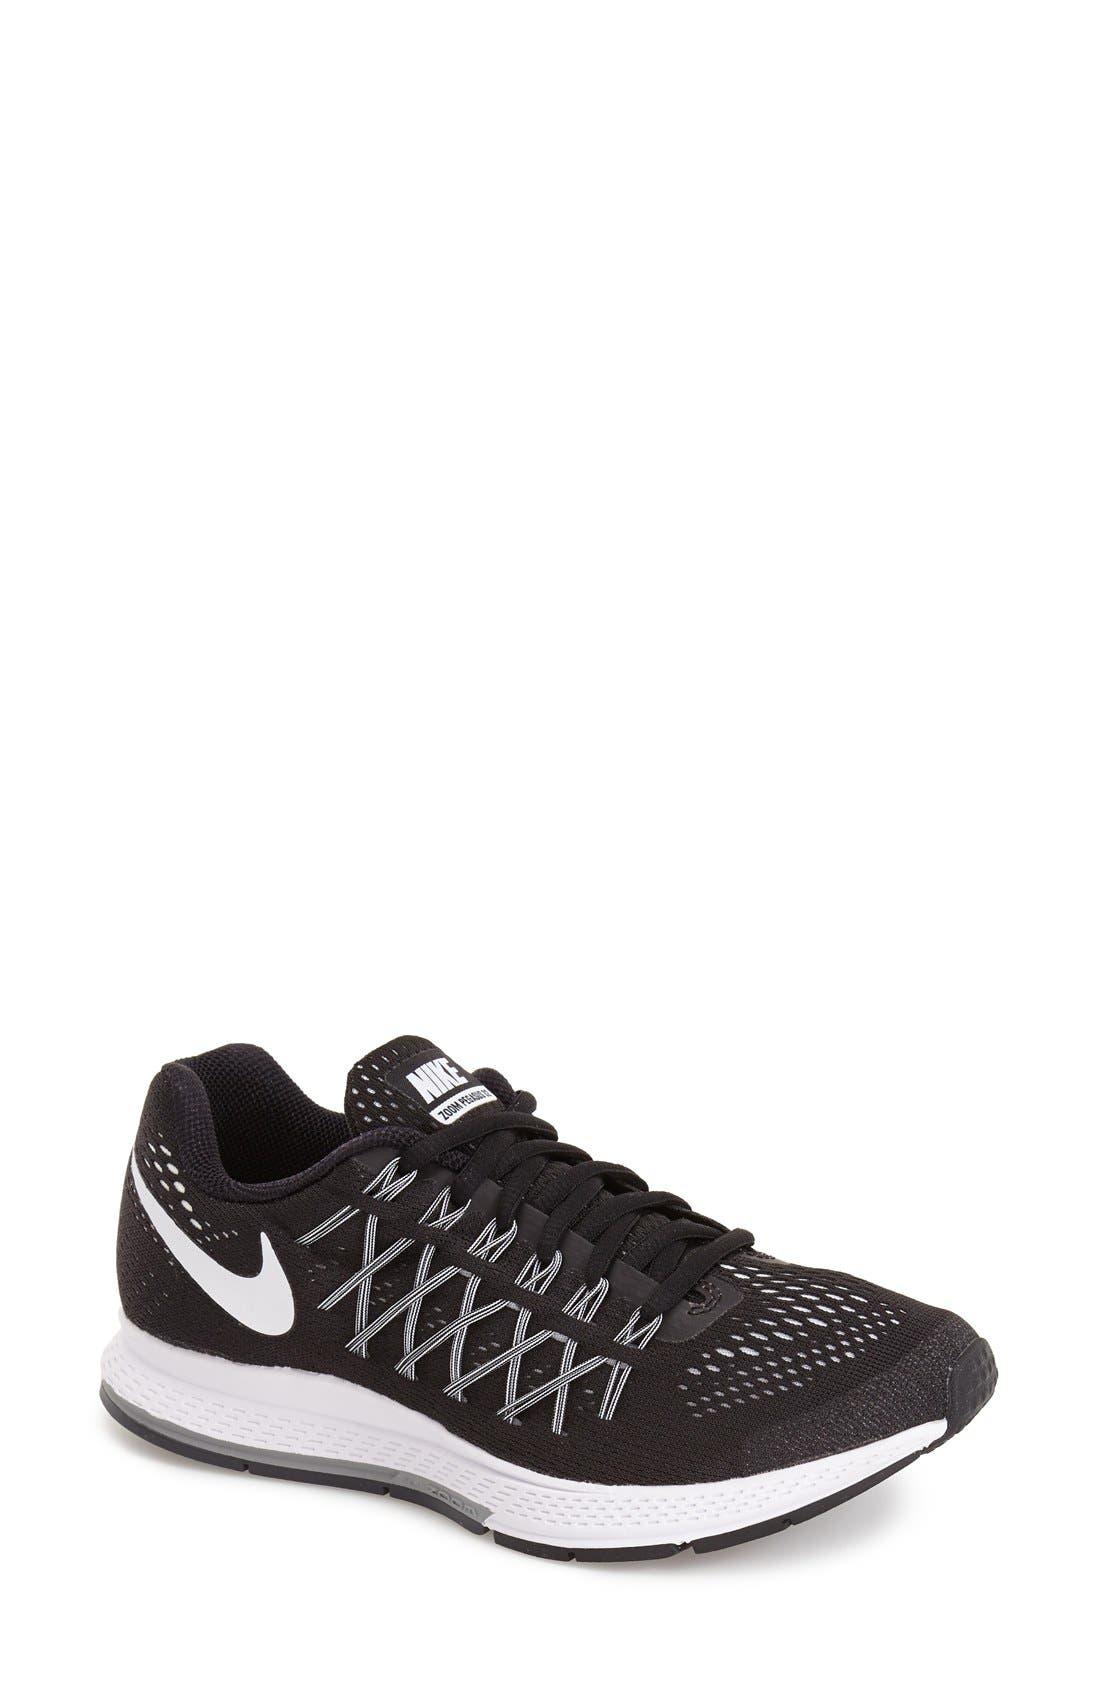 'Zoom Pegasus 32' Running Shoe,                             Main thumbnail 1, color,                             Black/ White/ Pure Platinum